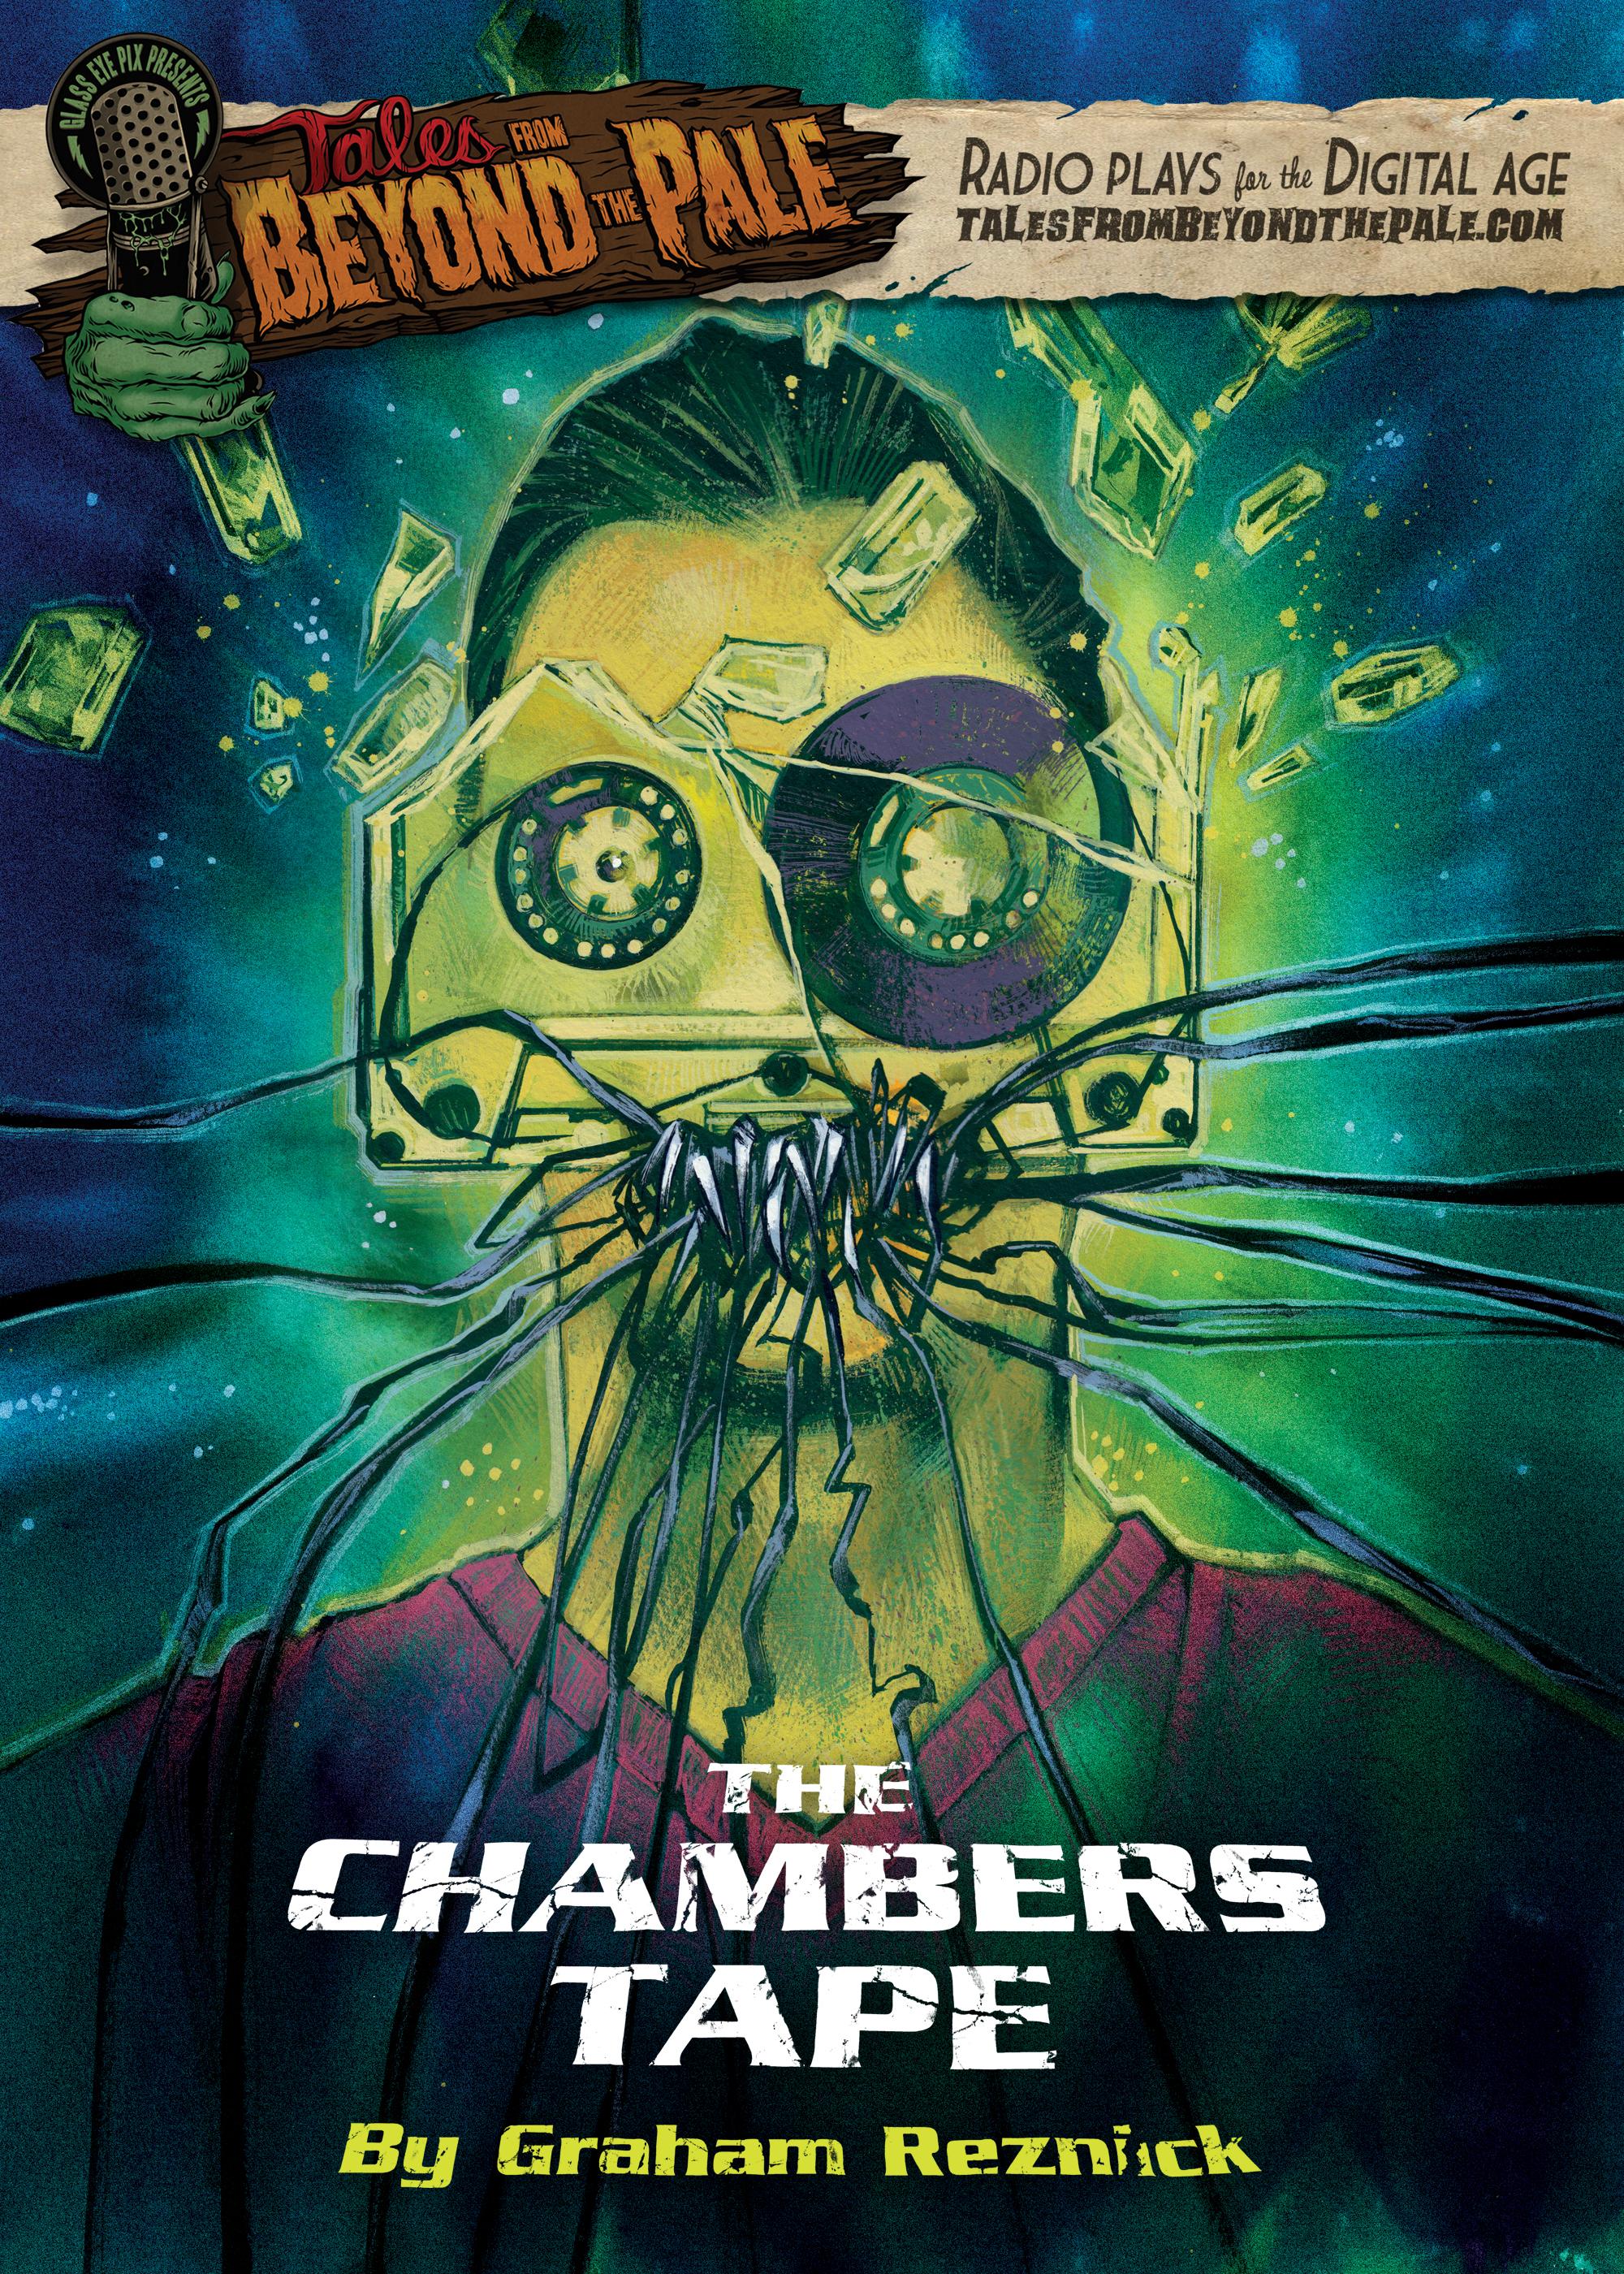 The Chambers Tape